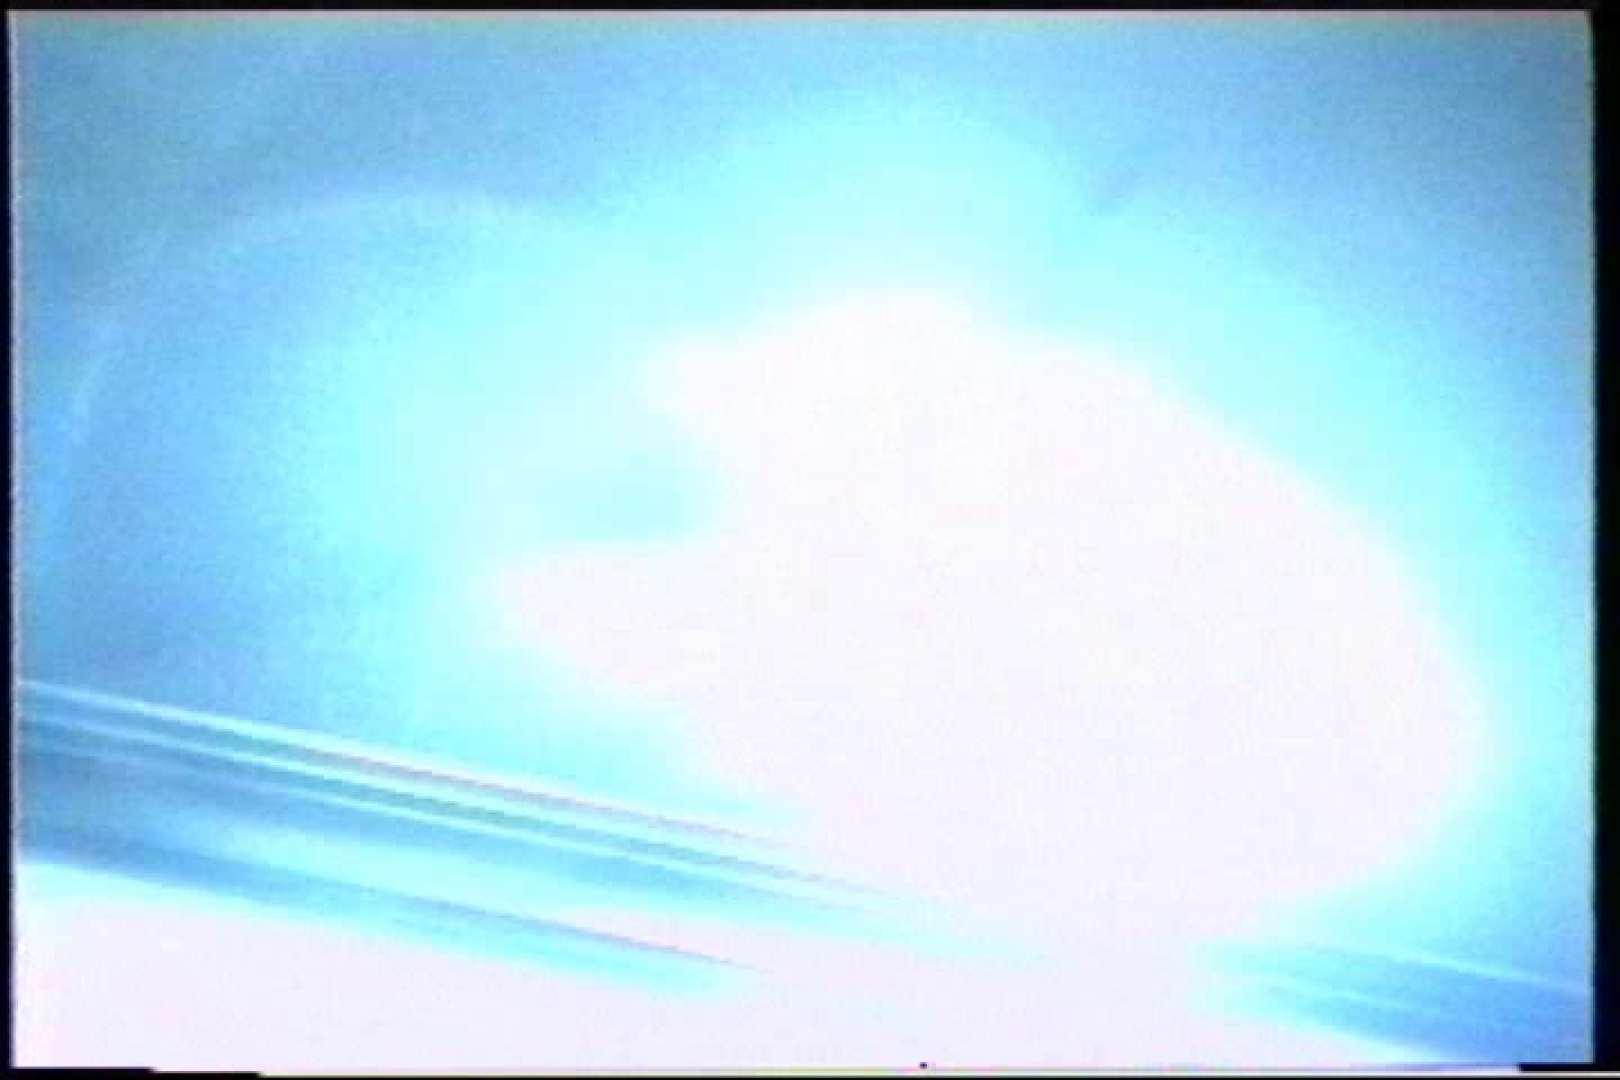 充血監督の深夜の運動会Vol.208 OL女体 | 車  107連発 16